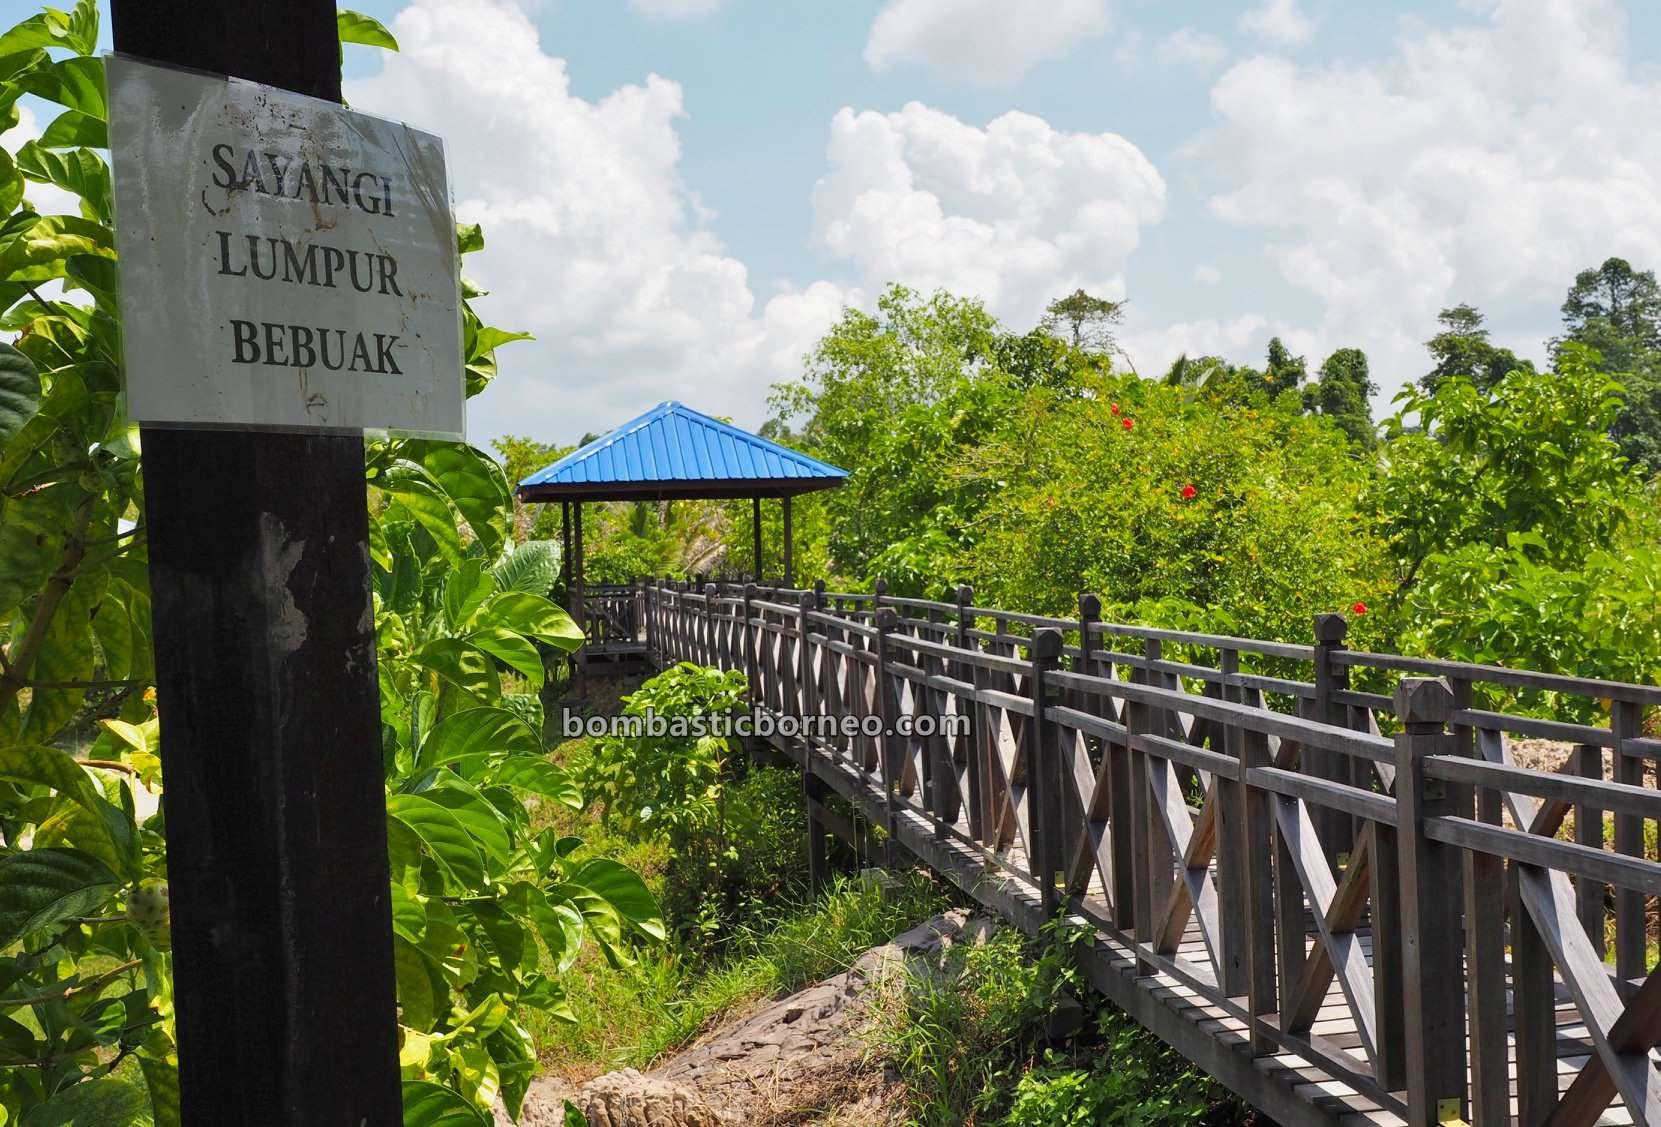 Mud Volcano, Mud Pools, Kampung Meritam, Village, destination, adventure, nature, outdoor, Tourism, tourist attraction, travel guide, Trans Border, Borneo, 马来西亚砂拉越林梦, 泥火山旅游景点,